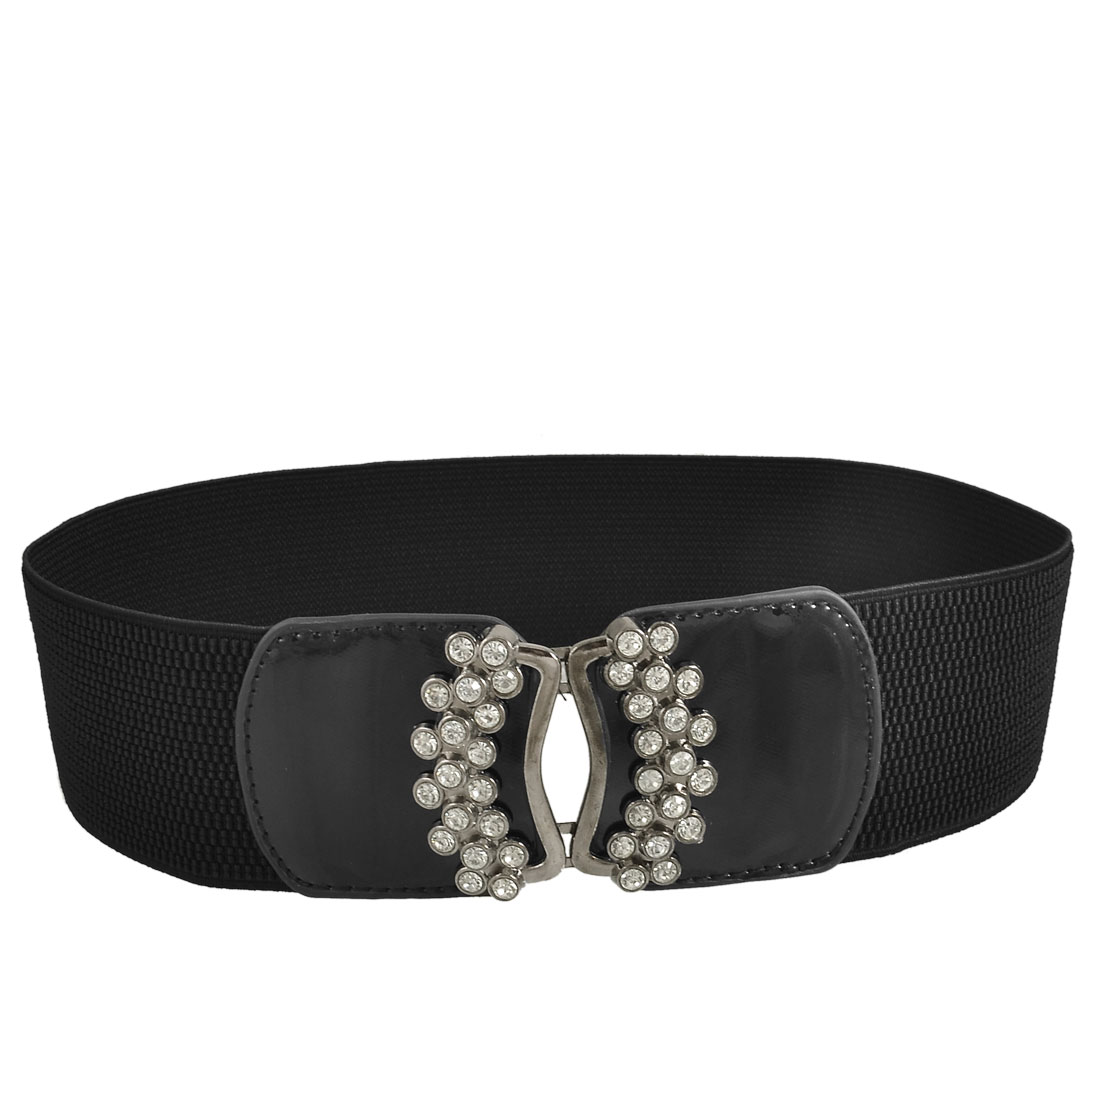 Dazzling Rhinestone Detail Hook Buckle Stretchy Waist Band Belt Black